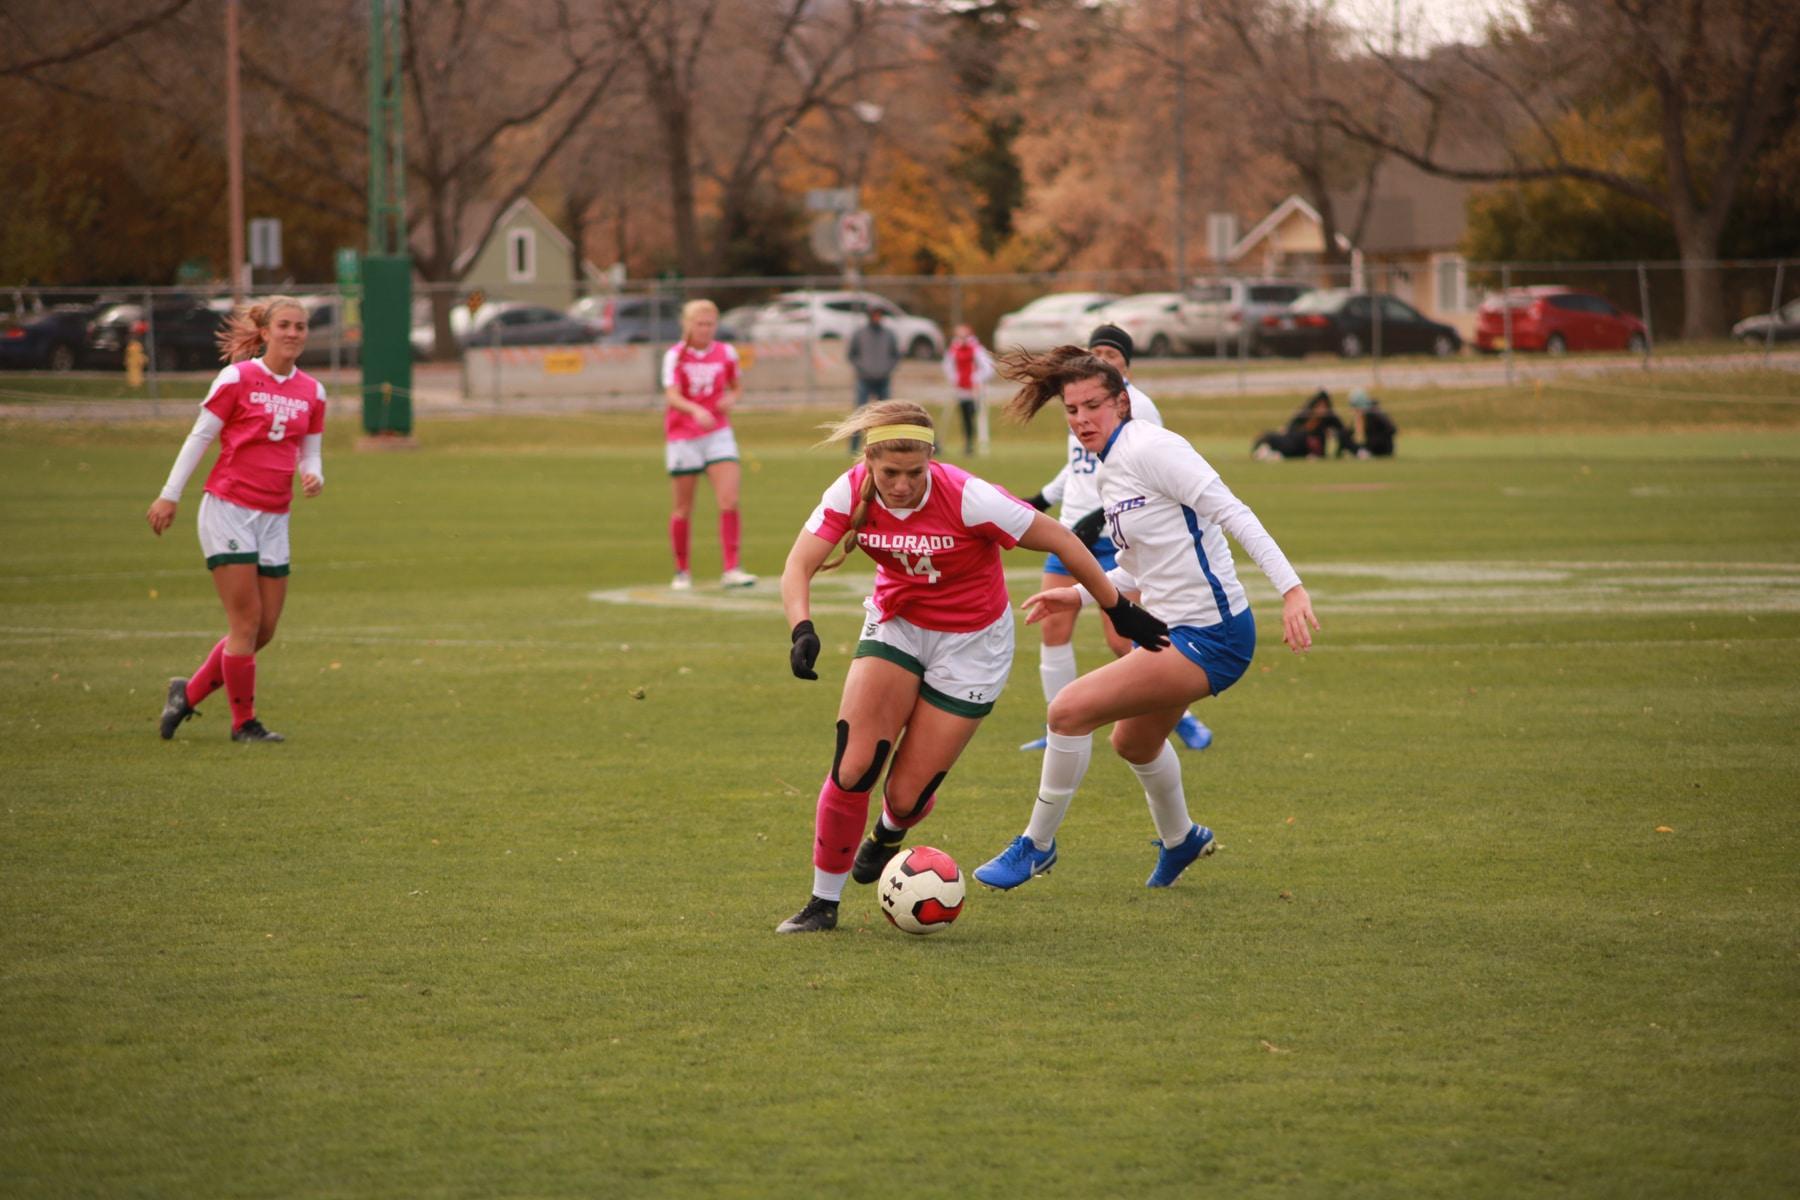 CSU soccer splits two games in windy weekend series